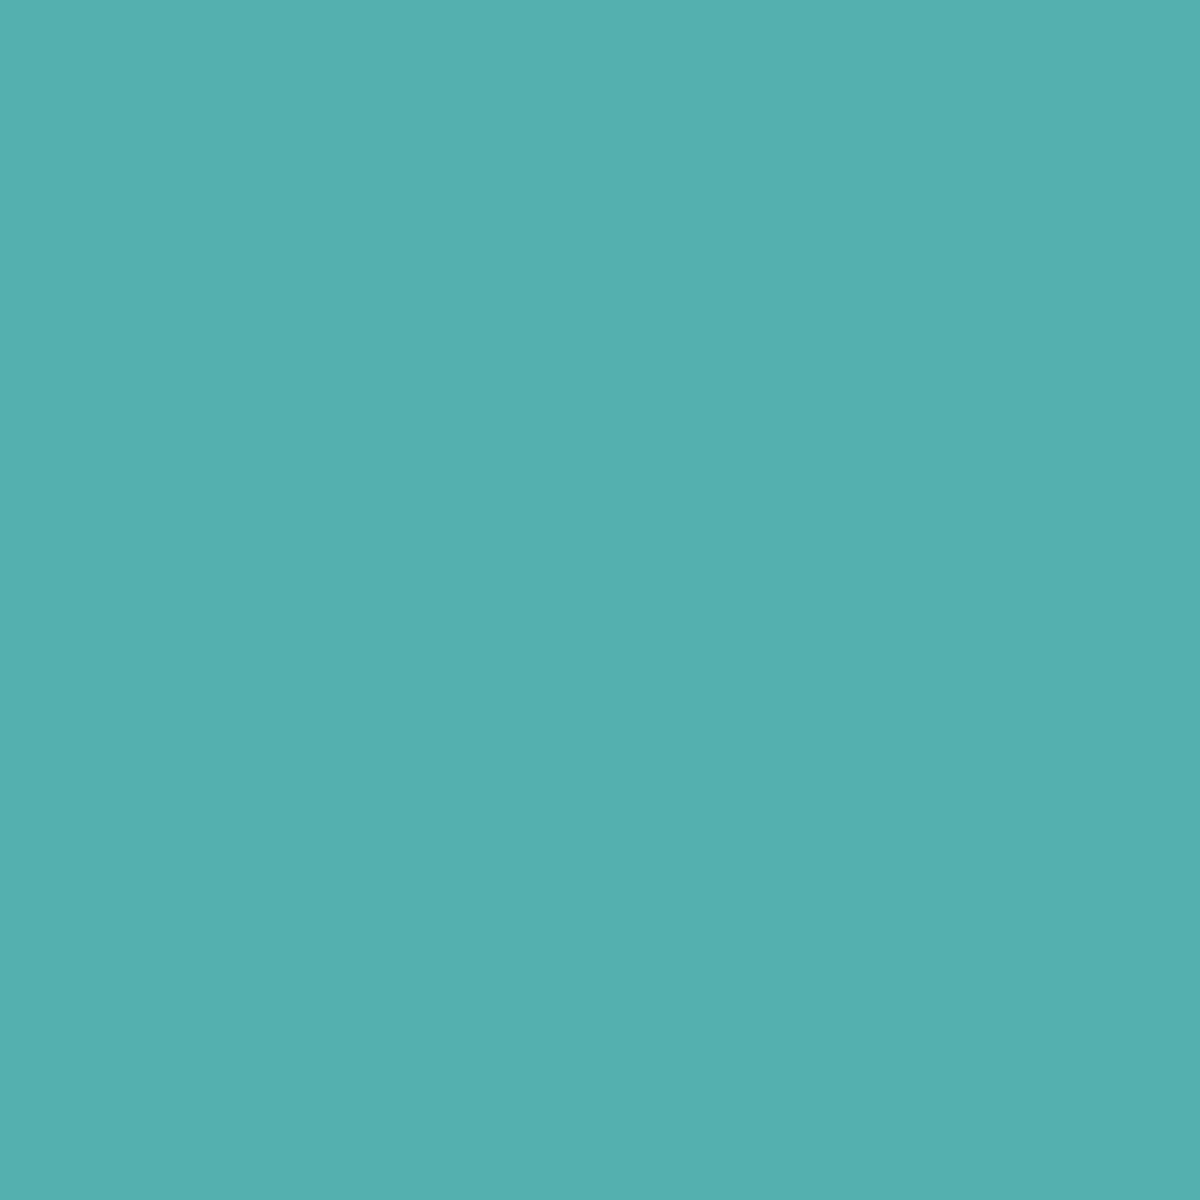 Blue-Turquoise